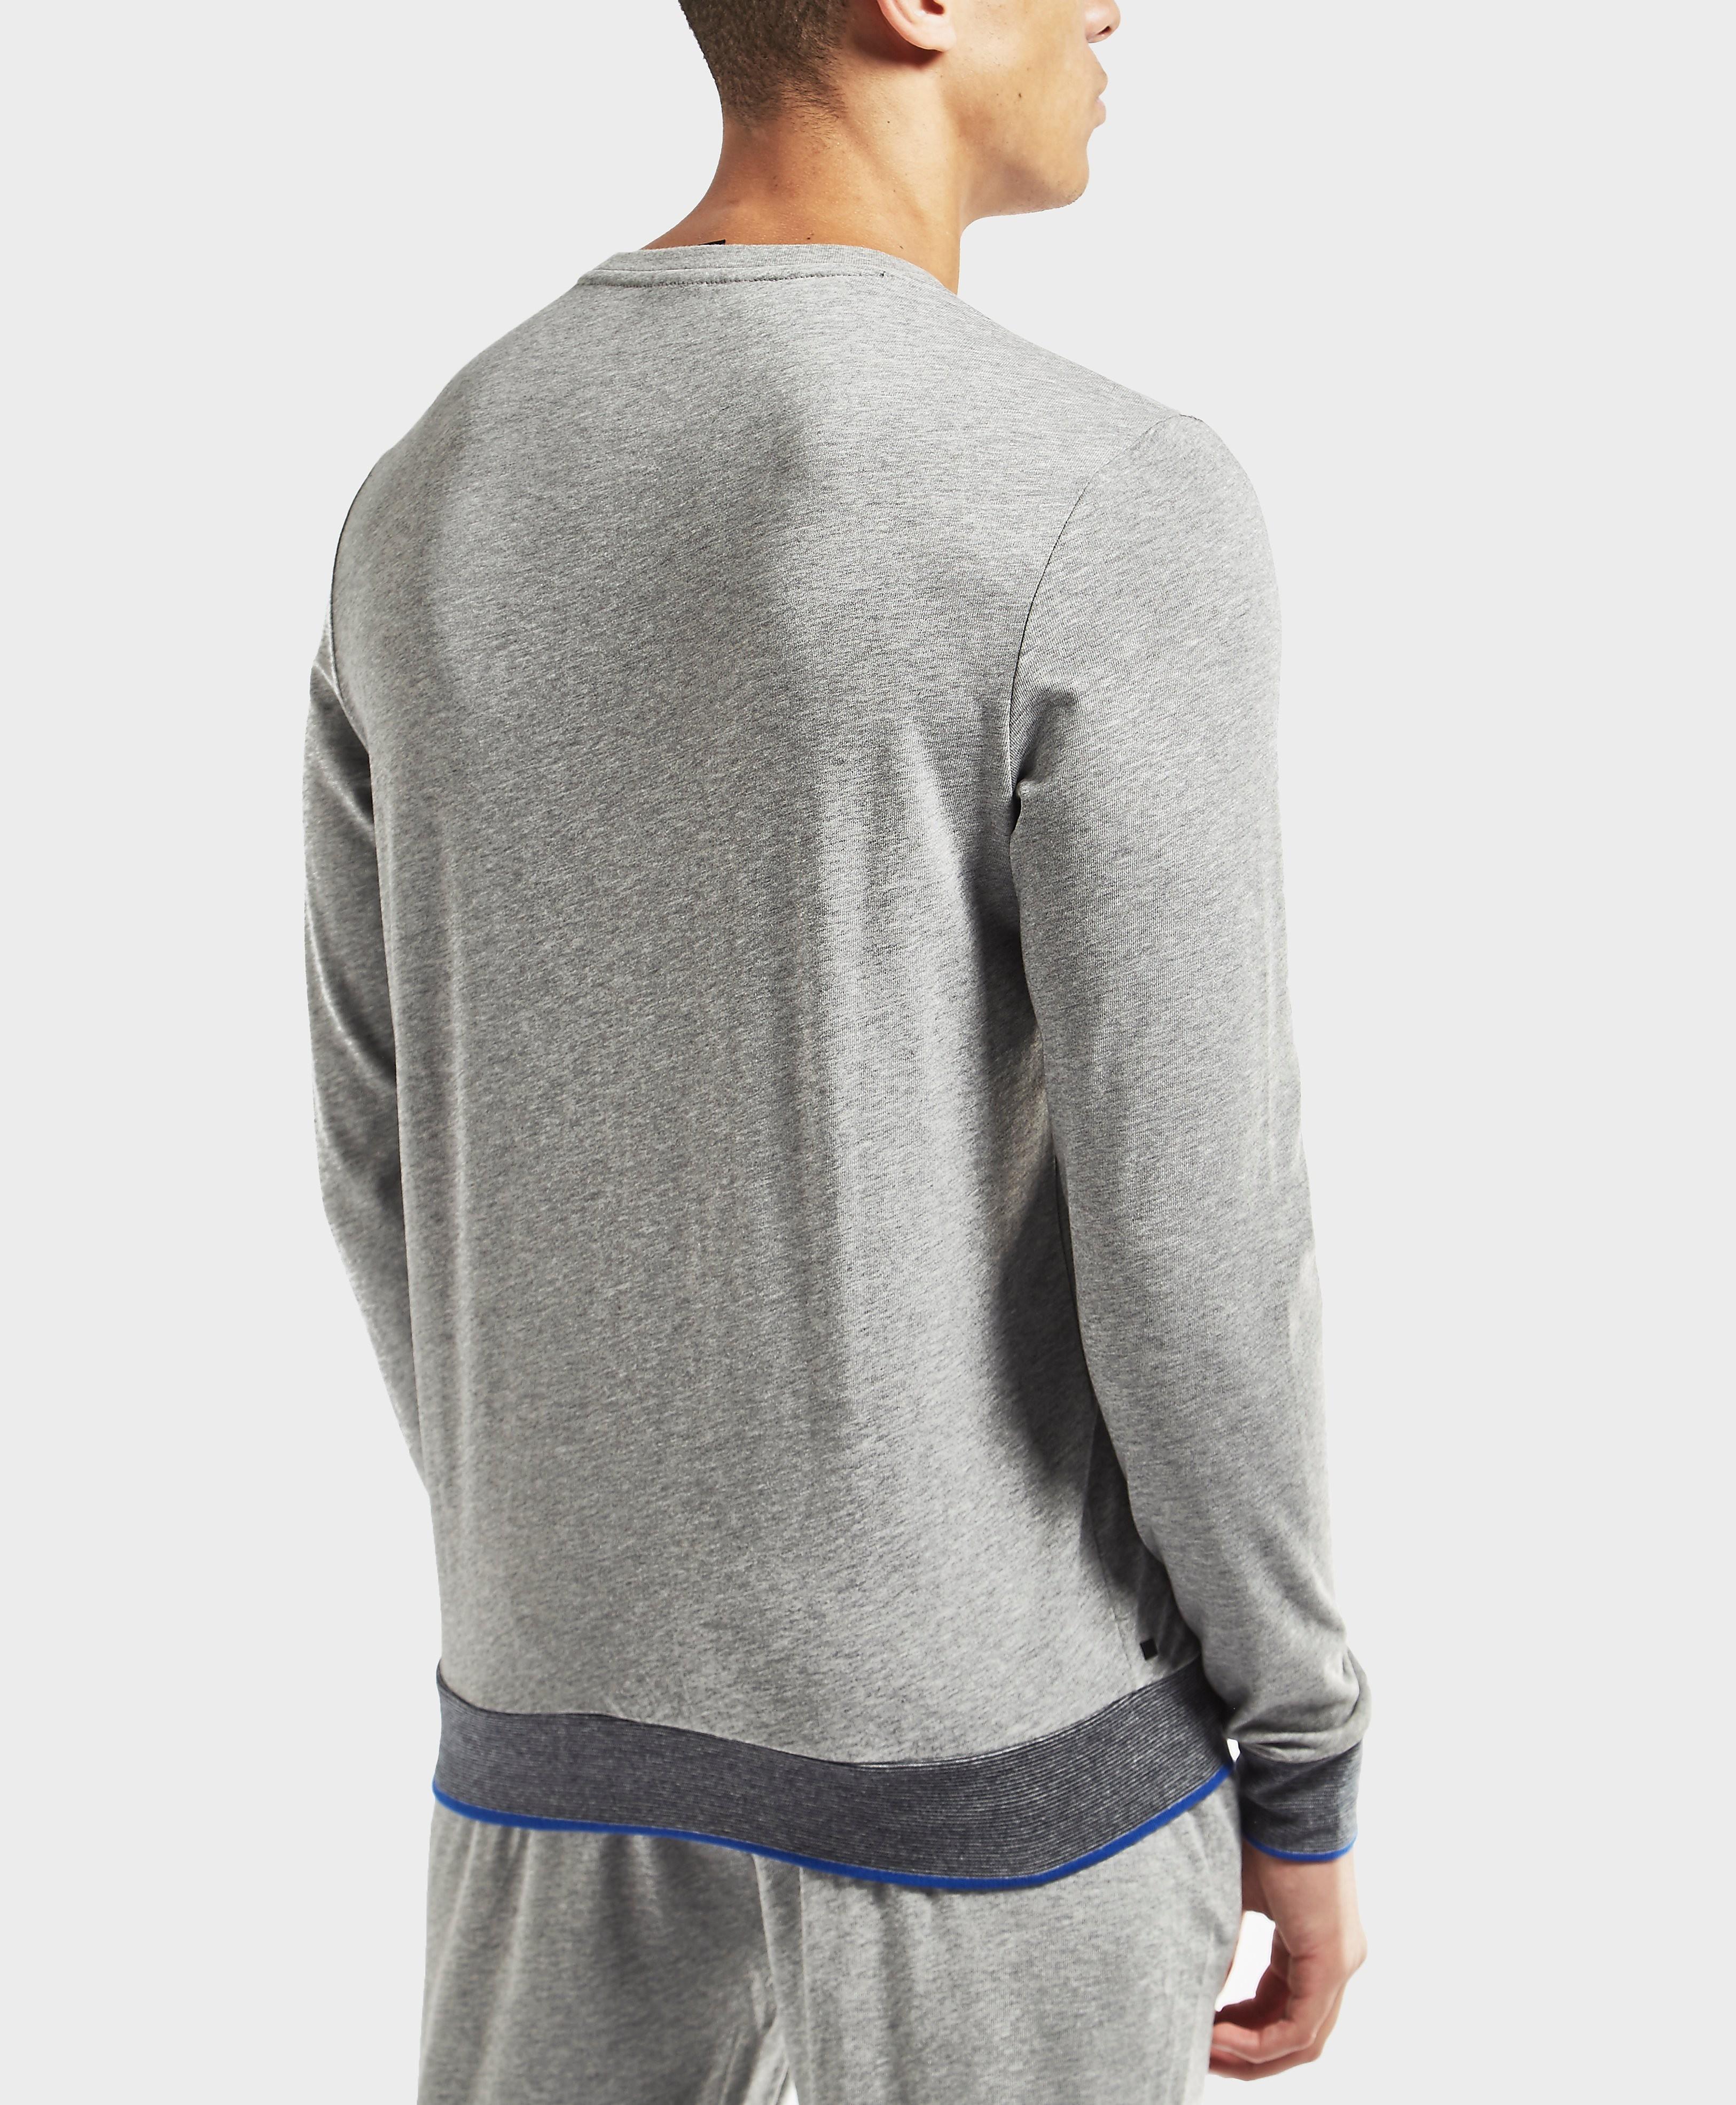 BOSS Authentic Crew Neck Sweatshirt